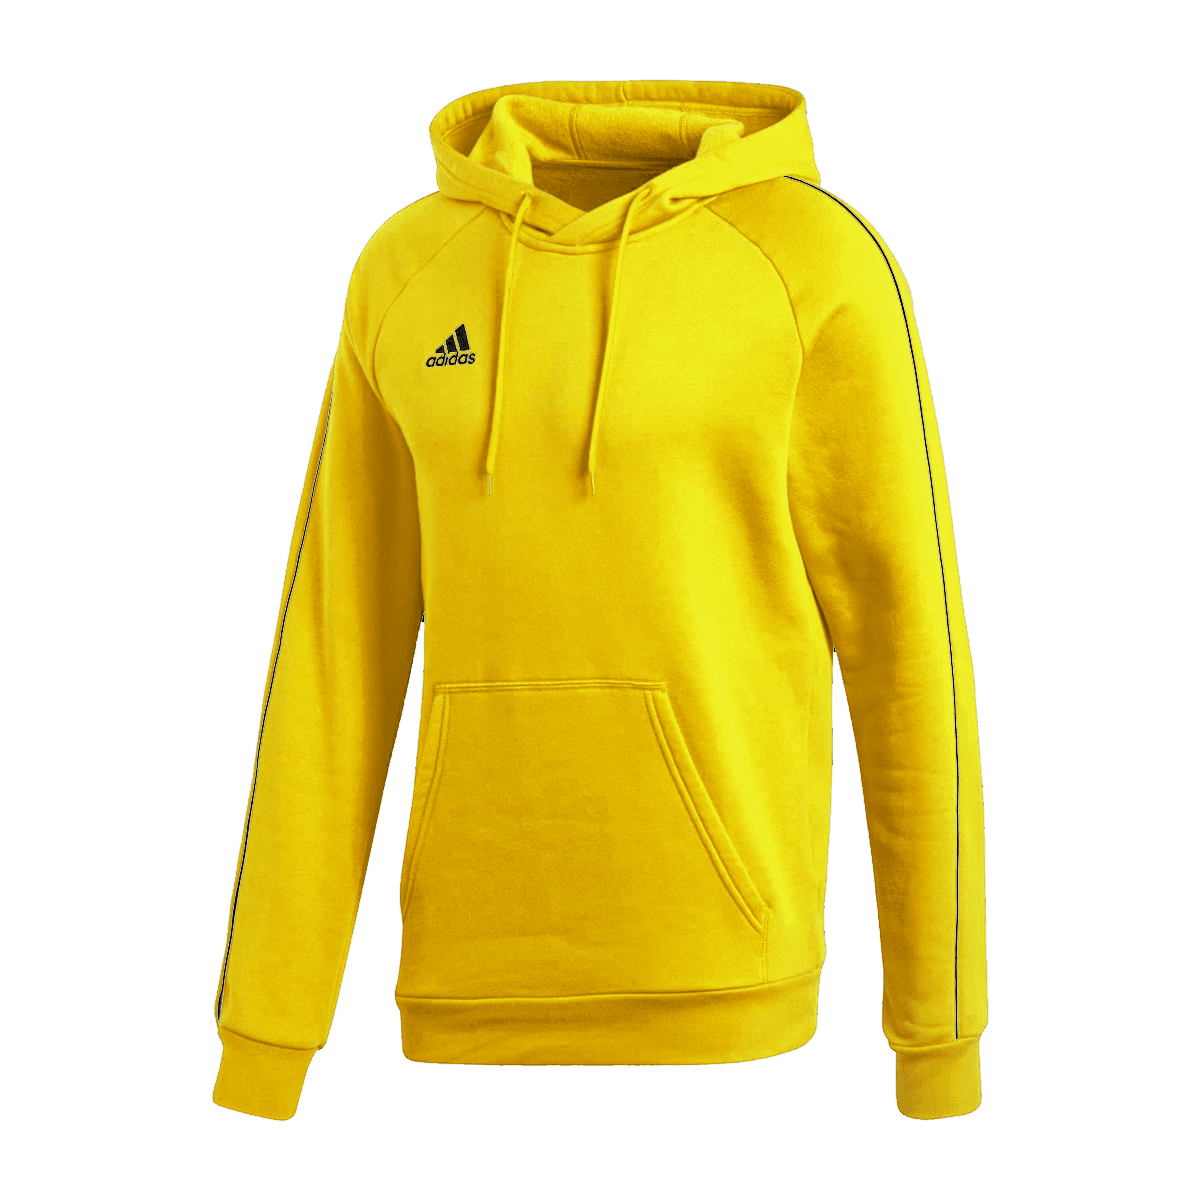 adidas Core 18 Hoody kapucnis pulóver sárgafekete Futball áruház